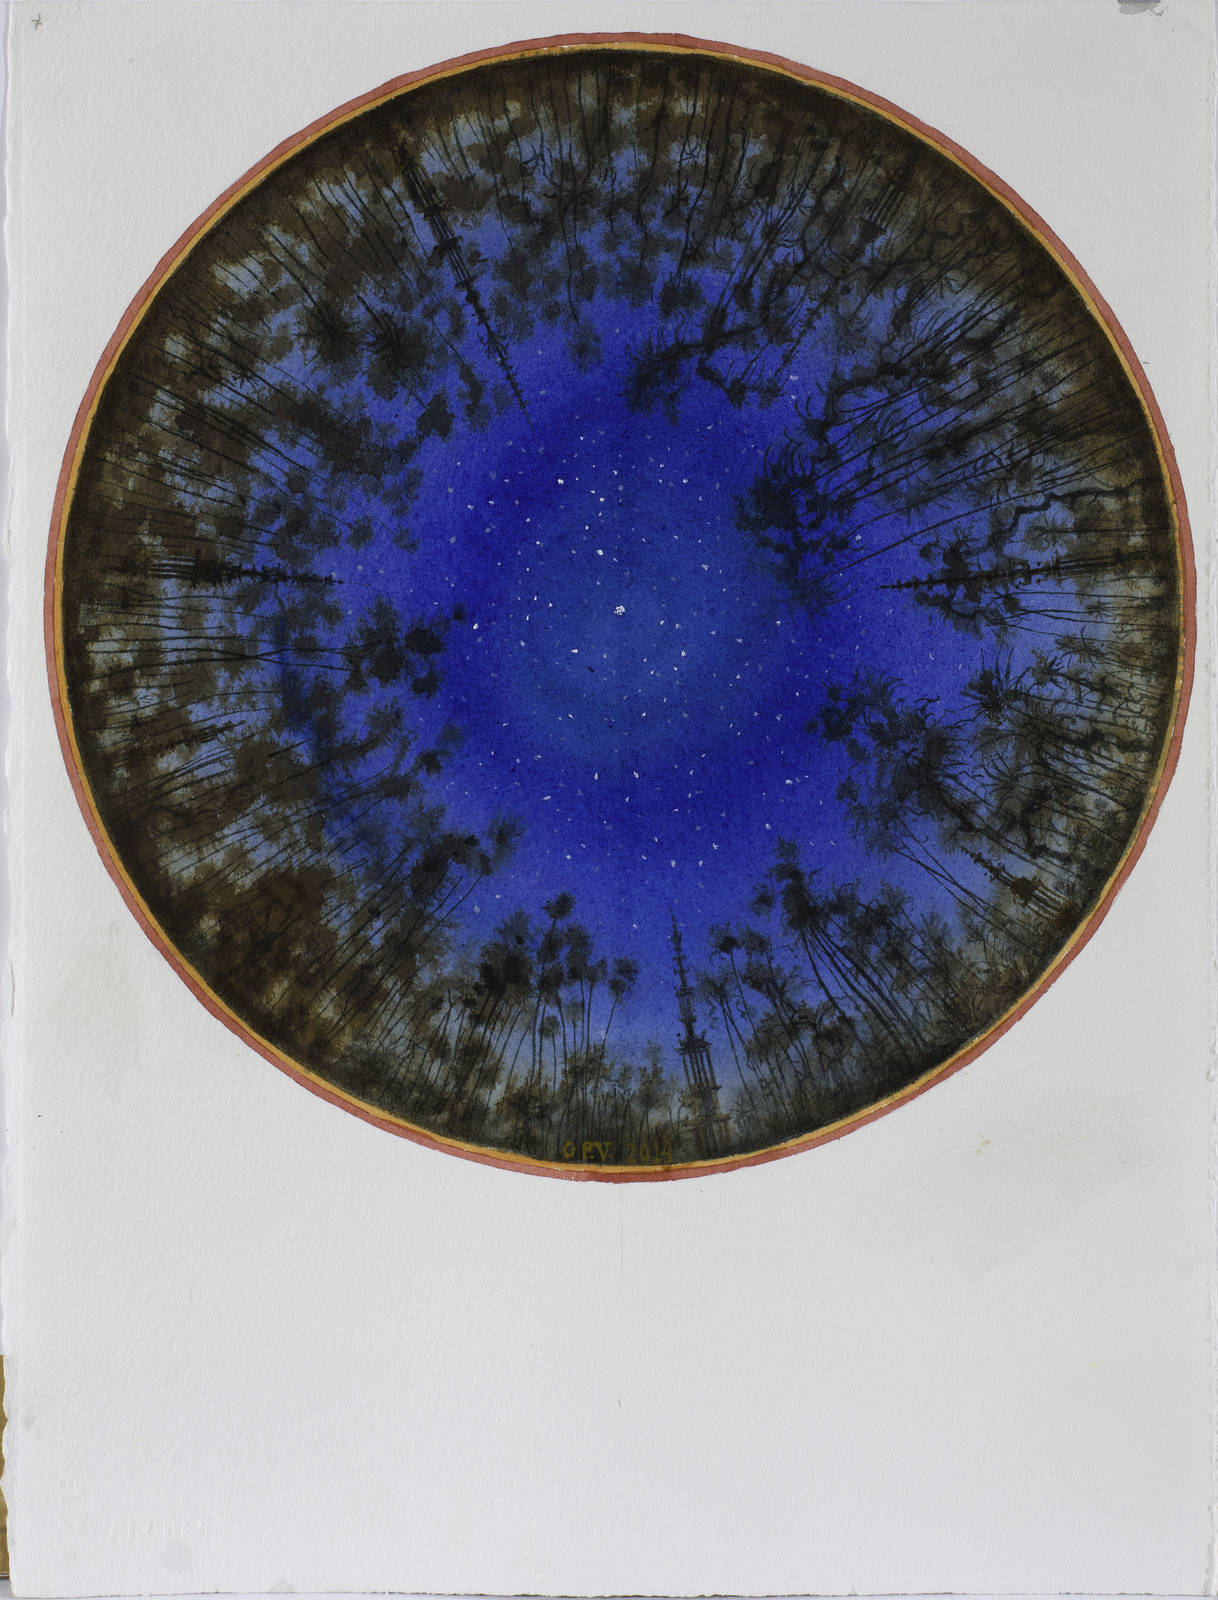 GUPE 15 Sin título, 2013, Acuarela, 38,5 x 57,5 cm